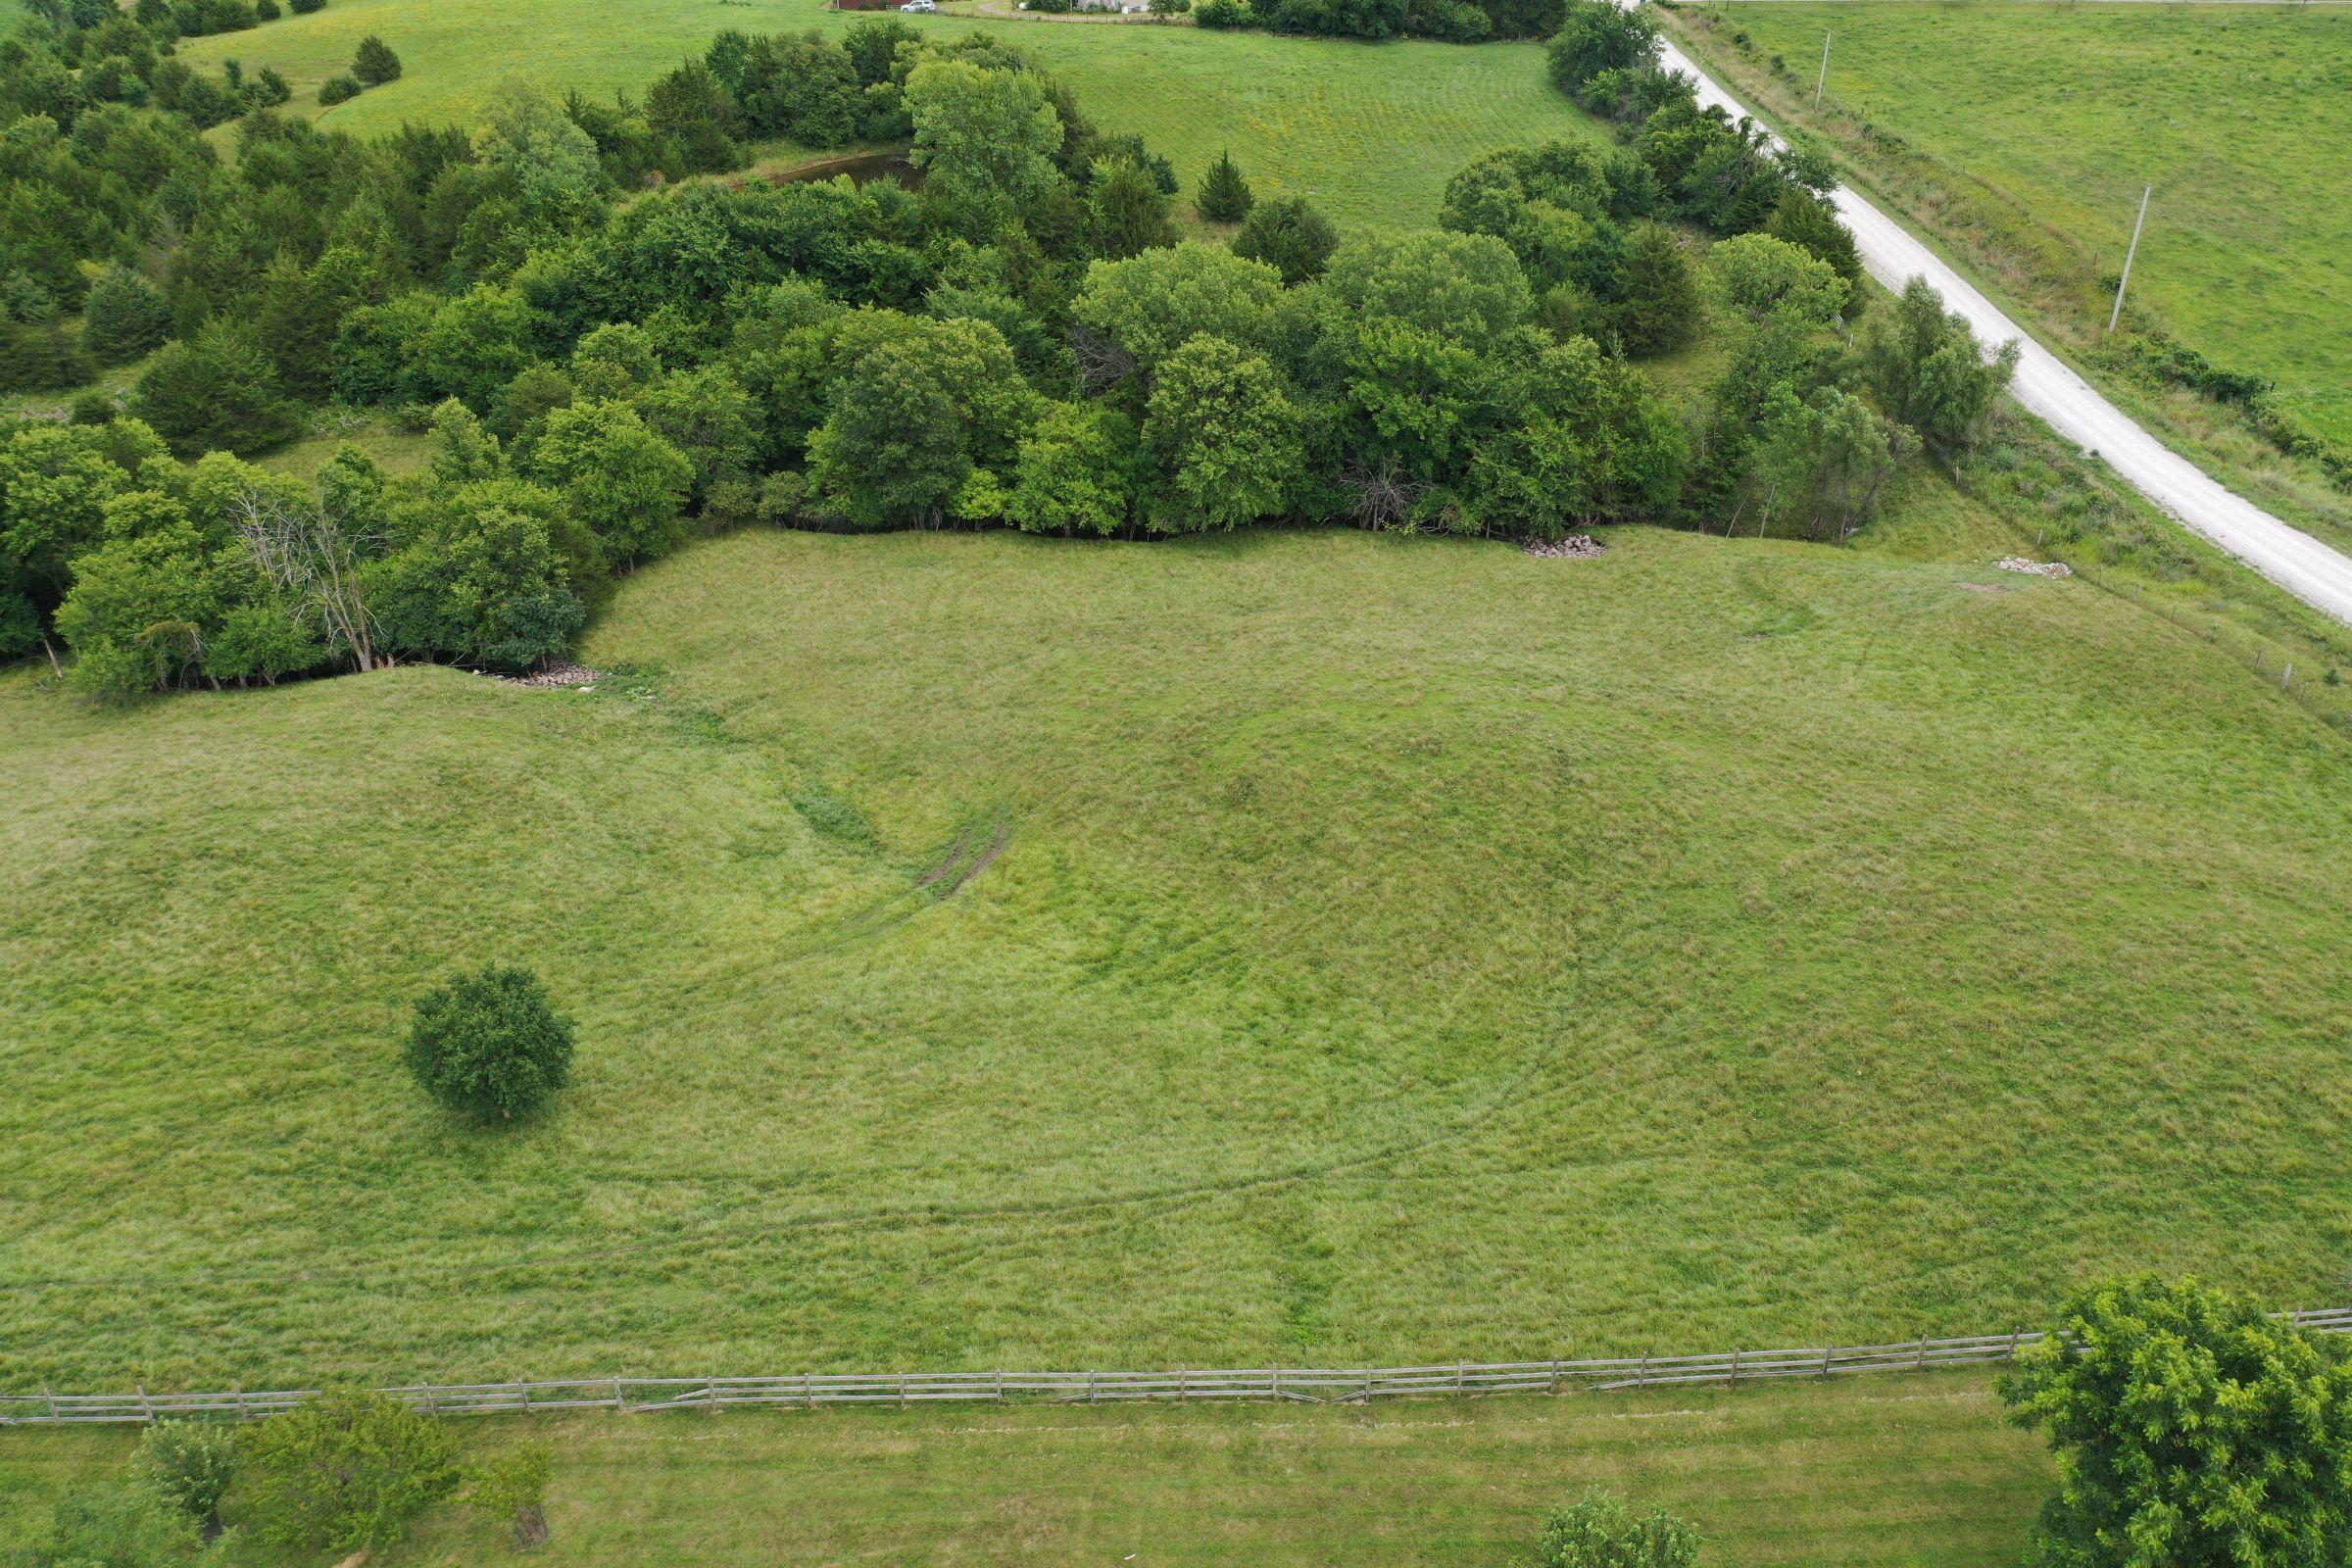 residential-warren-county-iowa-12-acres-listing-number-15104-3-2020-08-08-184617.jpg